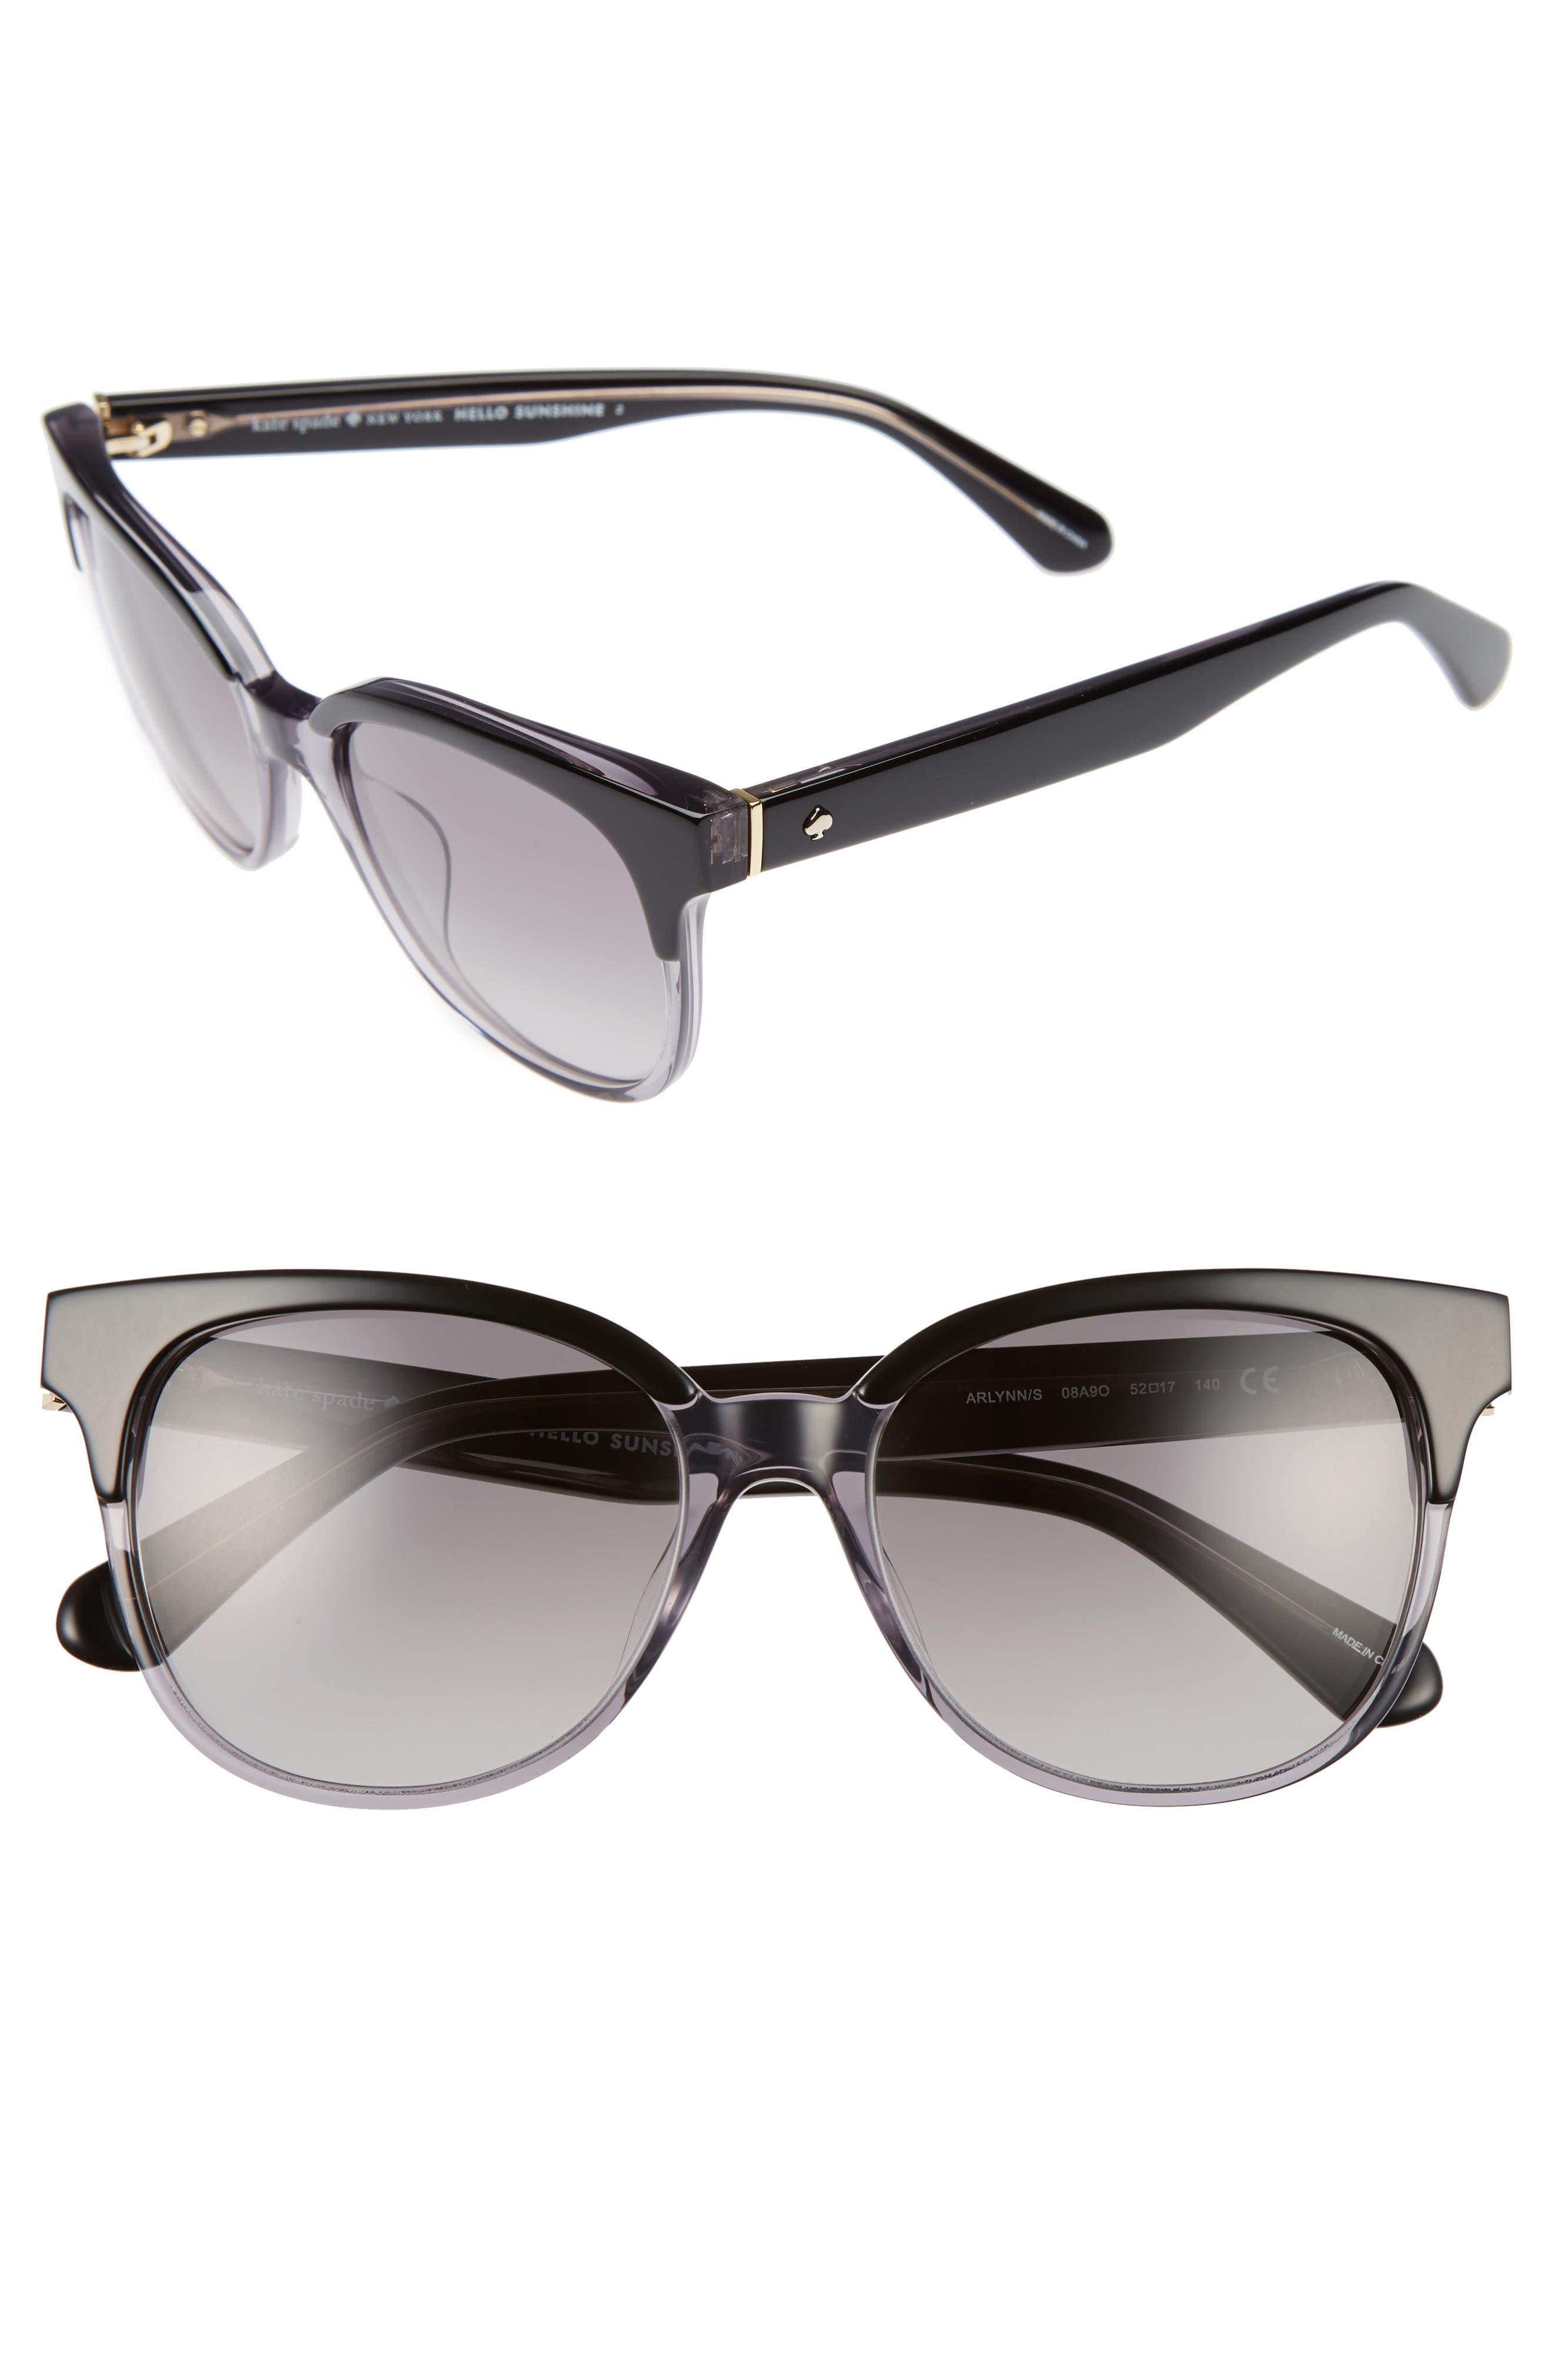 Main Image - kate spade new york arlynn 52mm Sunglasses